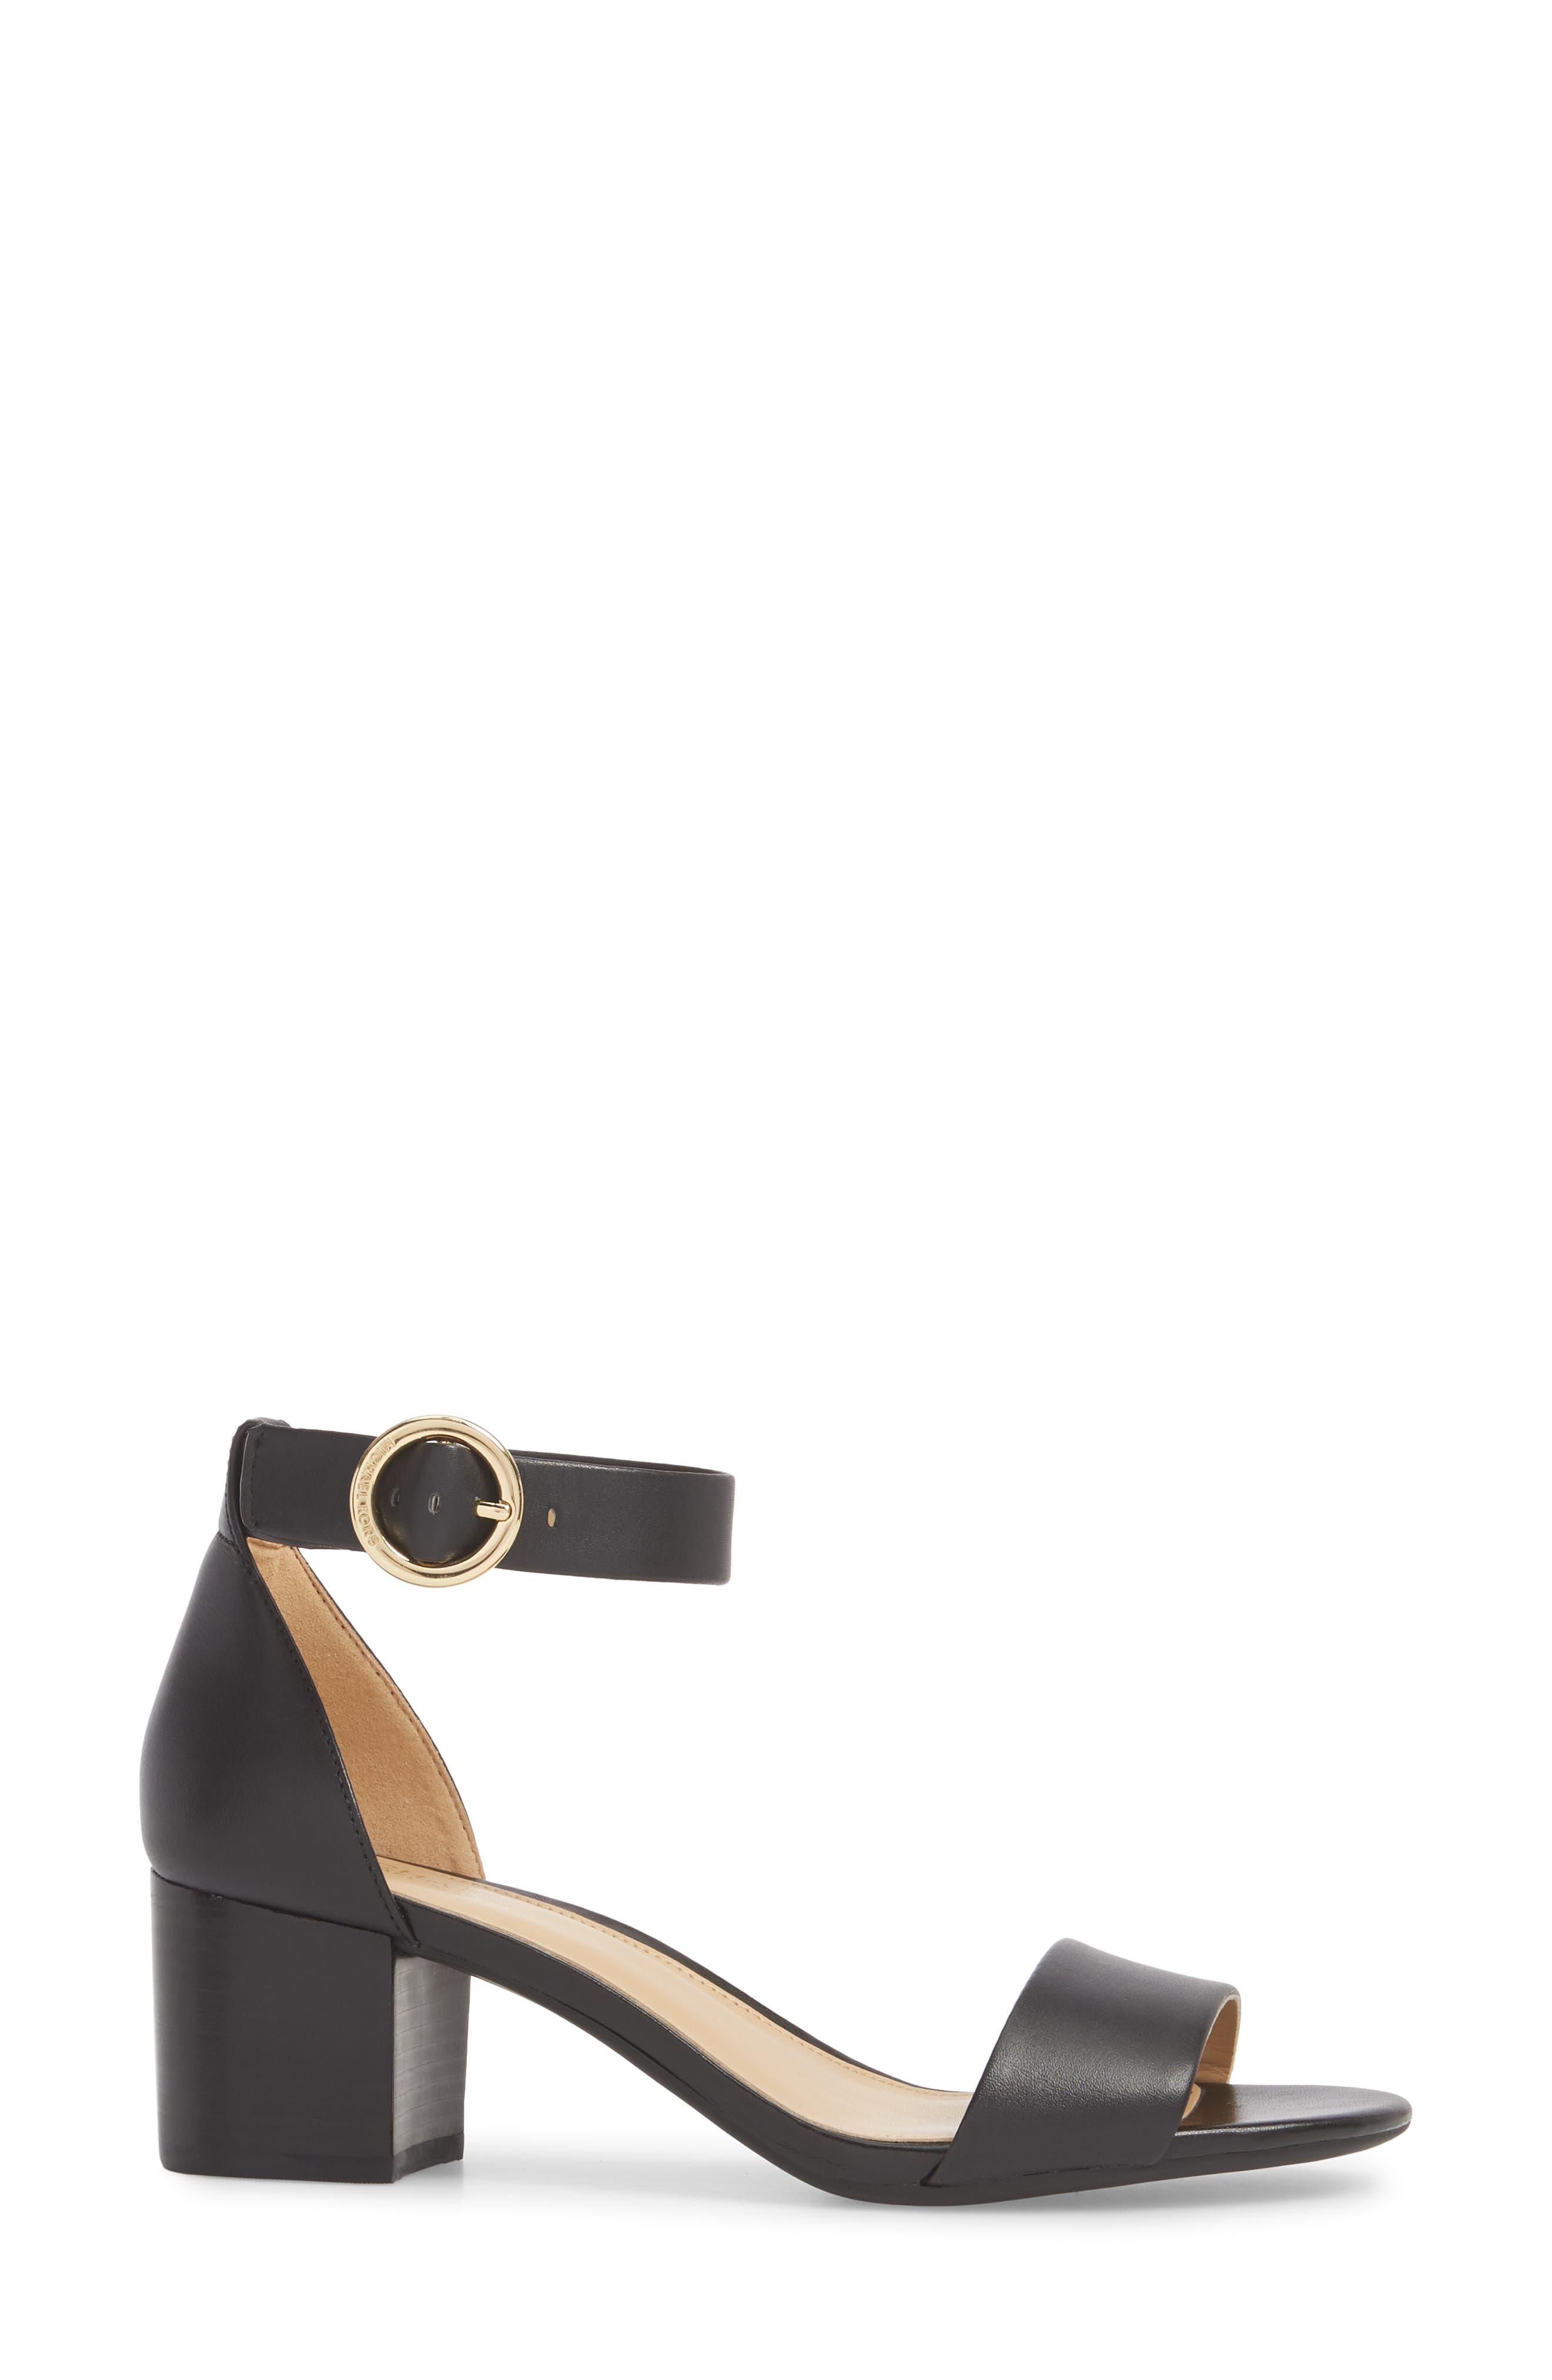 Lena Block Heel Sandal,                             Alternate thumbnail 3, color,                             BLACK